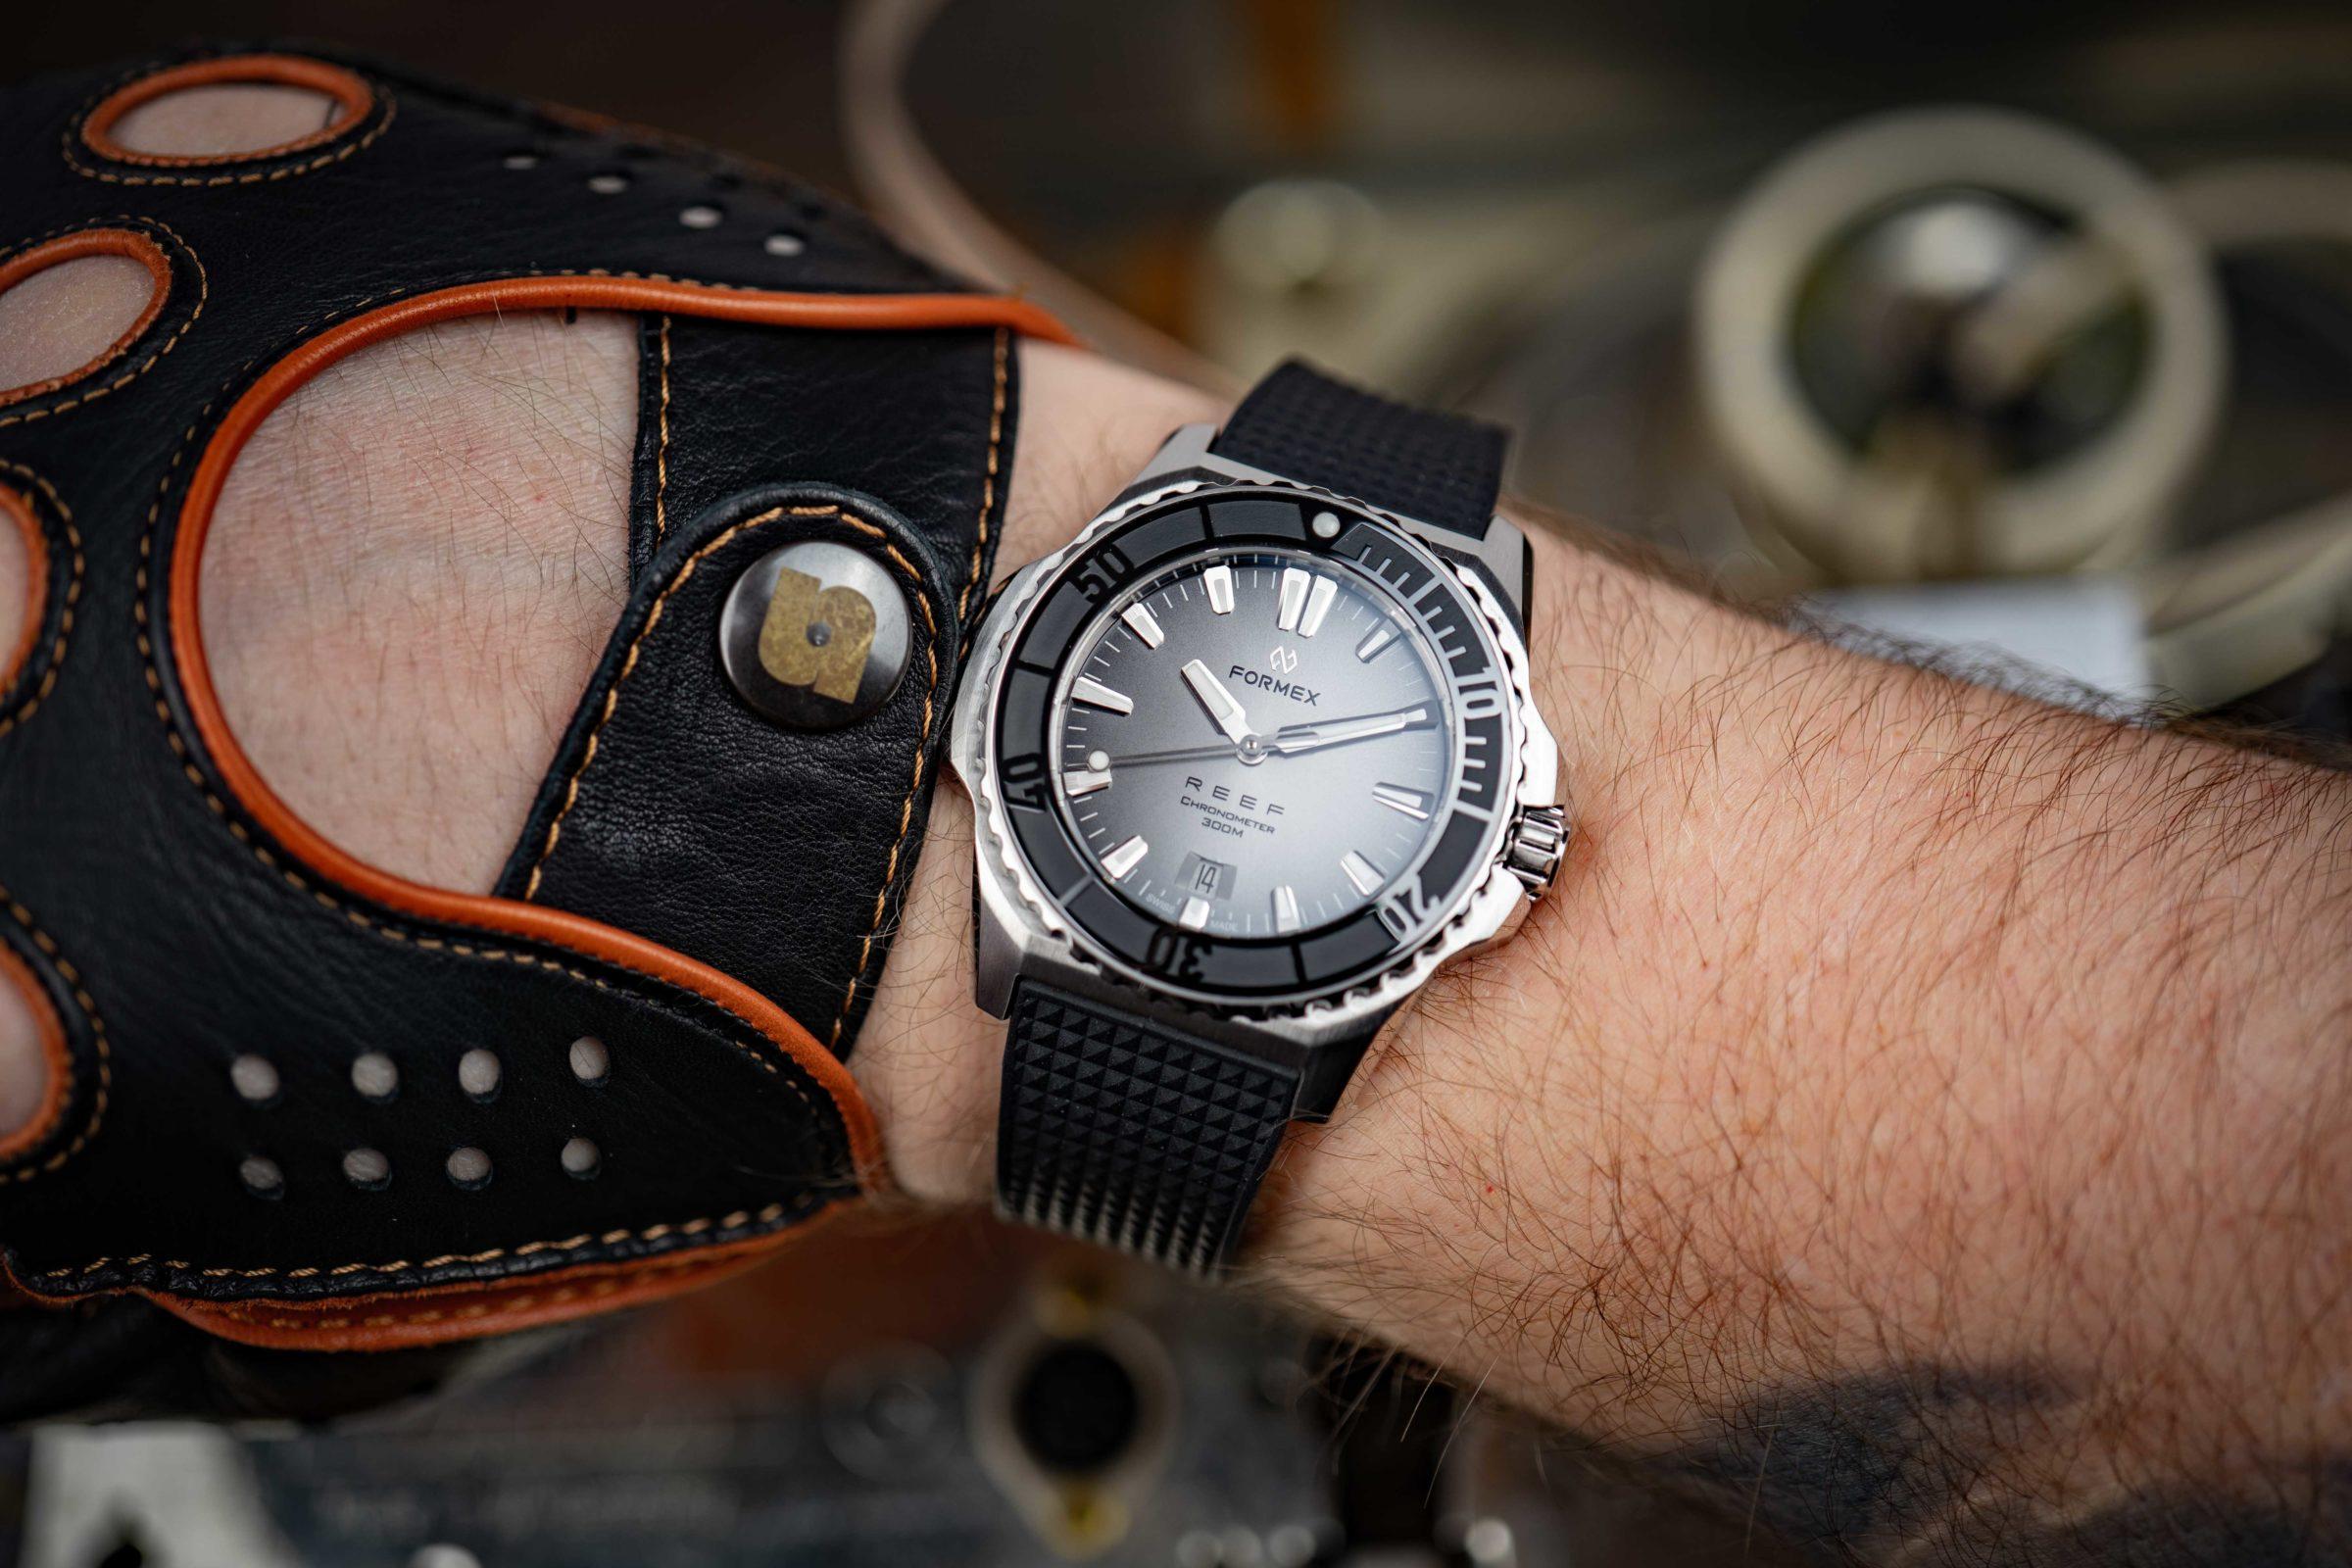 Formex-Reef-Automatik-Chronometer-300m-17